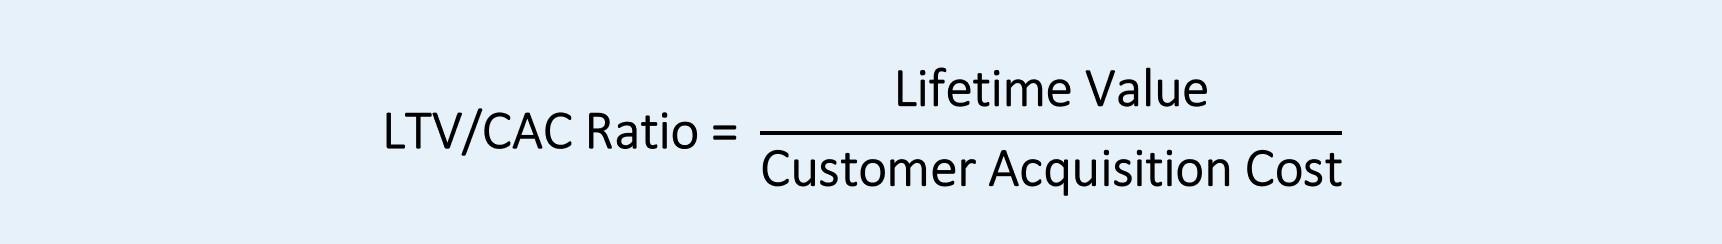 LTV/CAC Ratio Formula